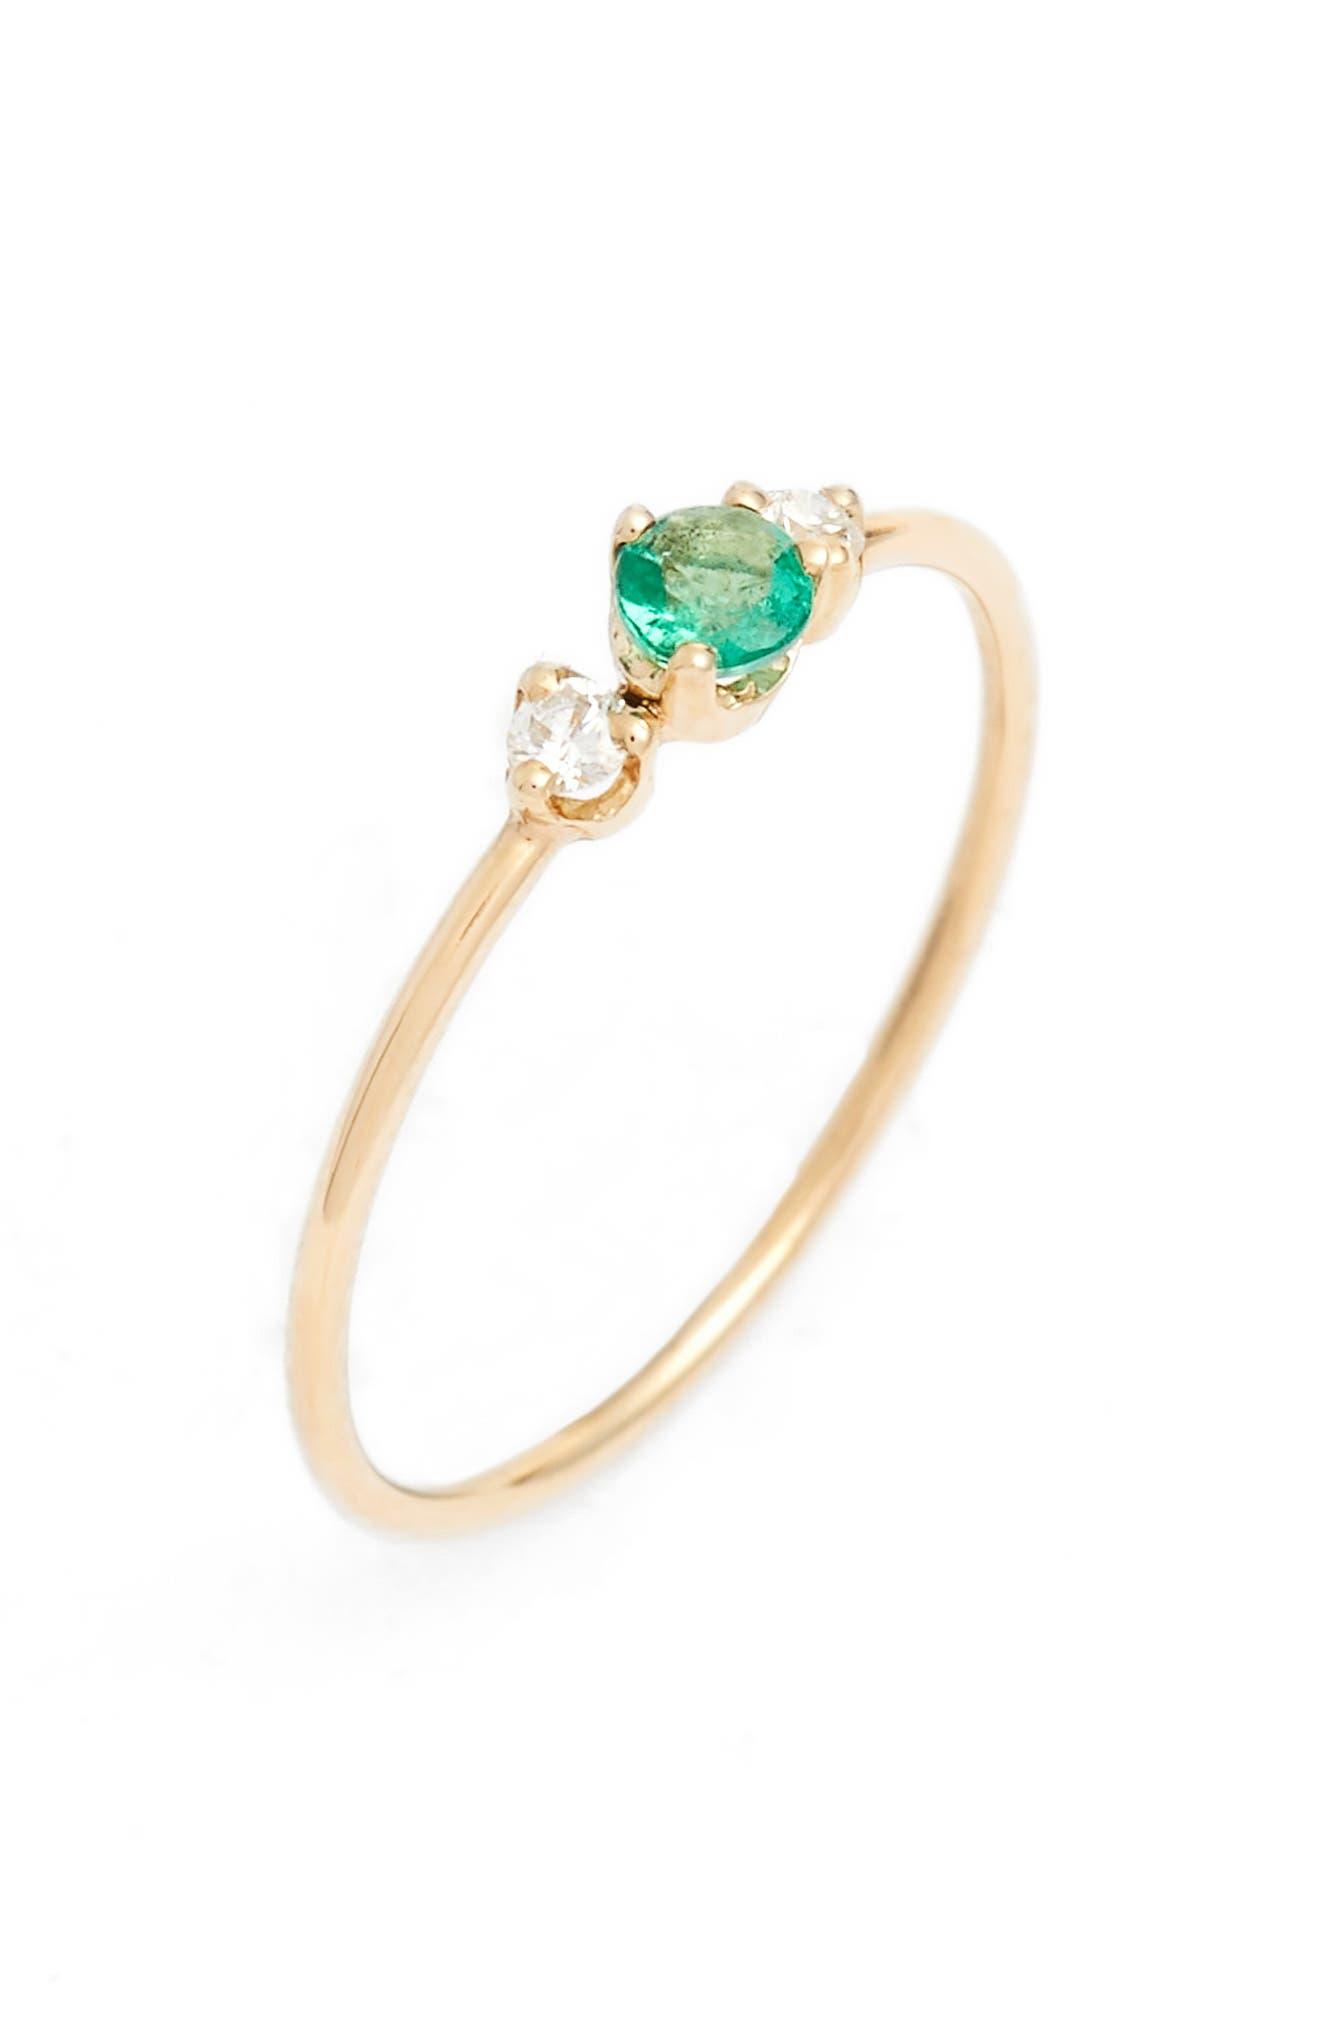 ZOË CHICCO, Emerald & Diamond Stack Ring, Main thumbnail 1, color, YELLOW GOLD/ EMERALD